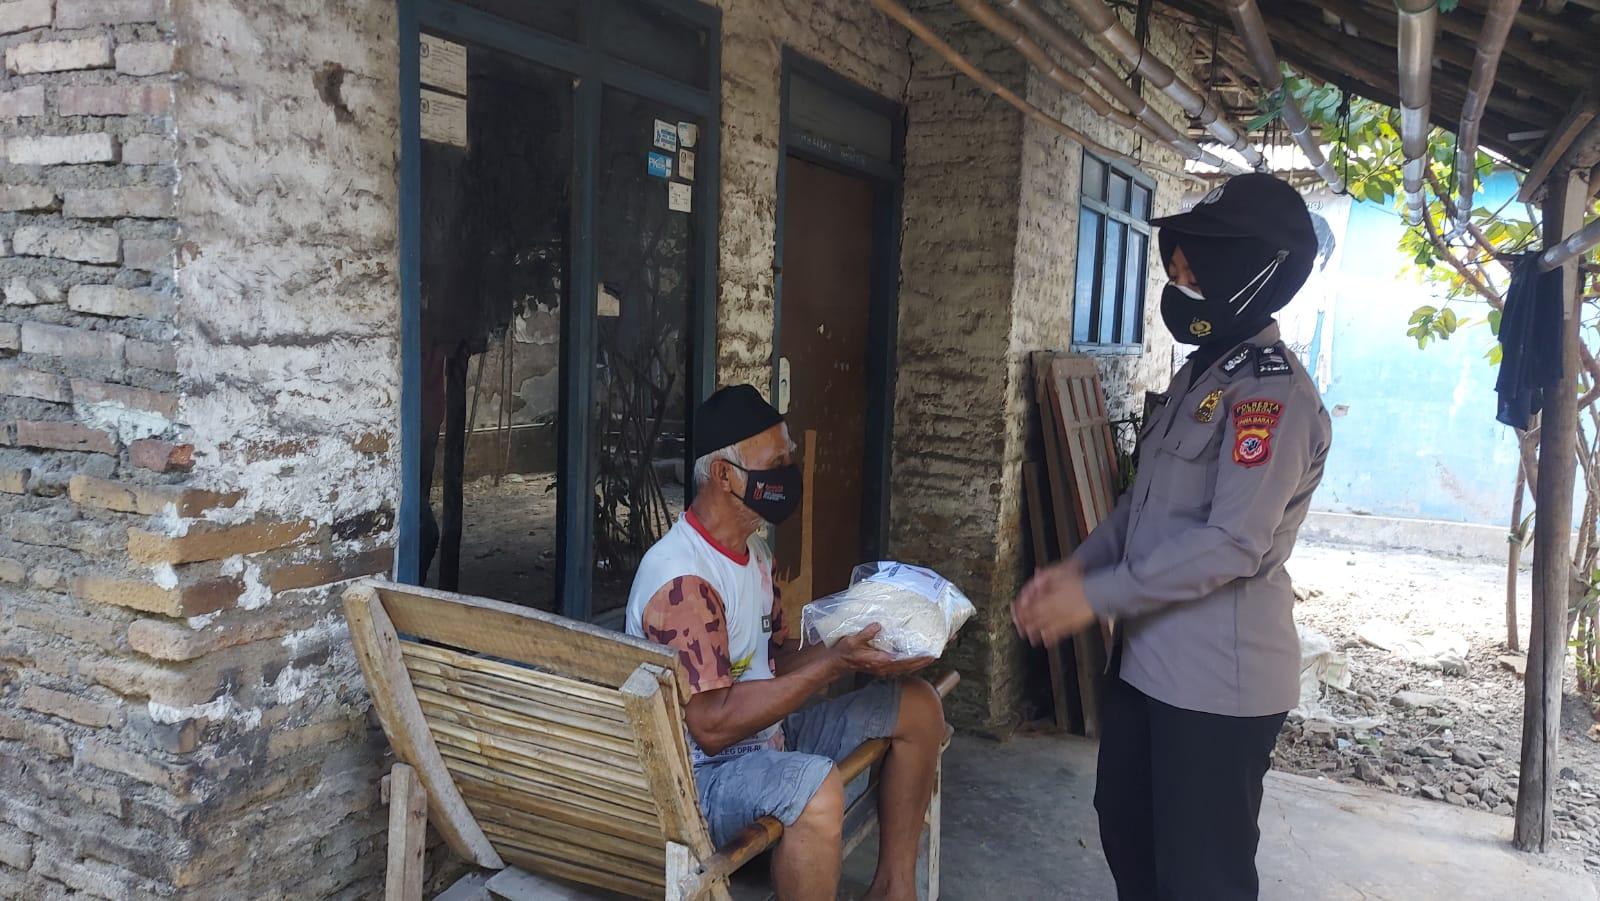 Polresta Cirebon Bagikan Sembako Kepada Warga Slum Area